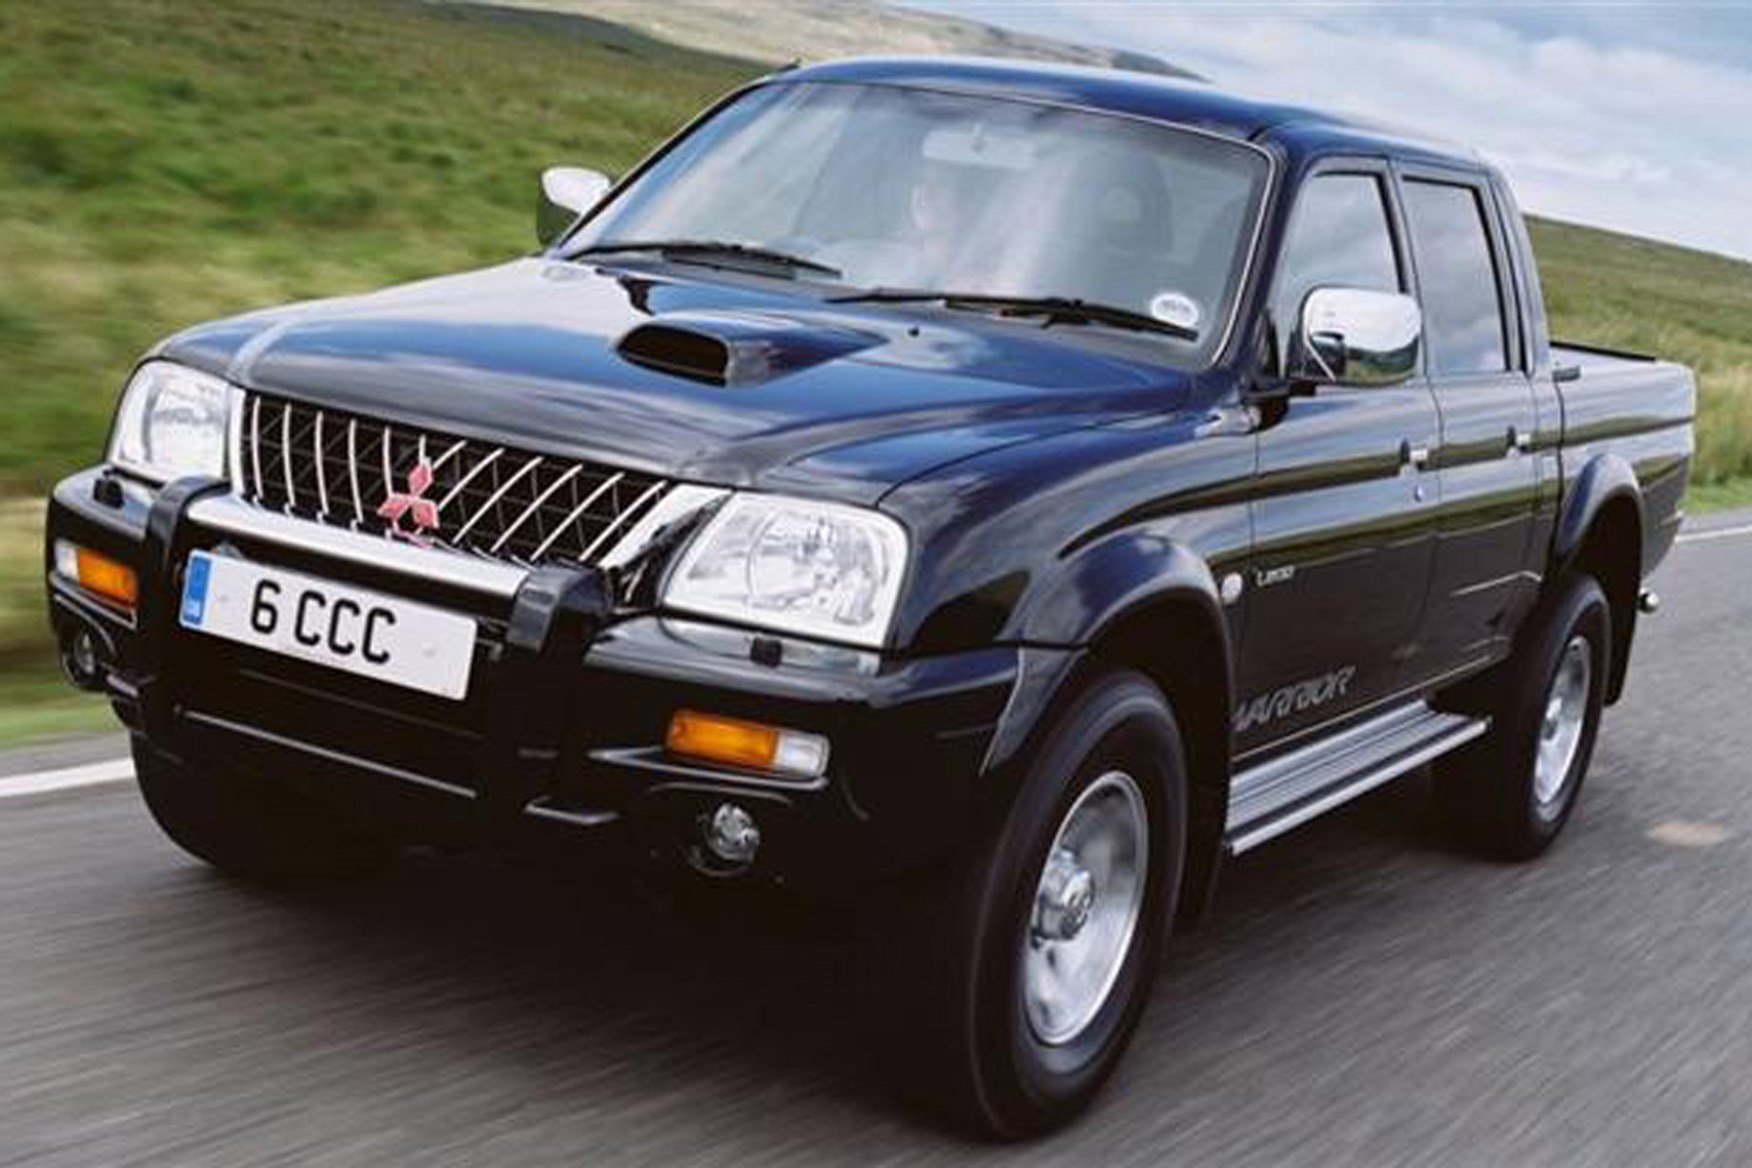 Mitsubishi L200 pickup review (1988-2006) | Parkers